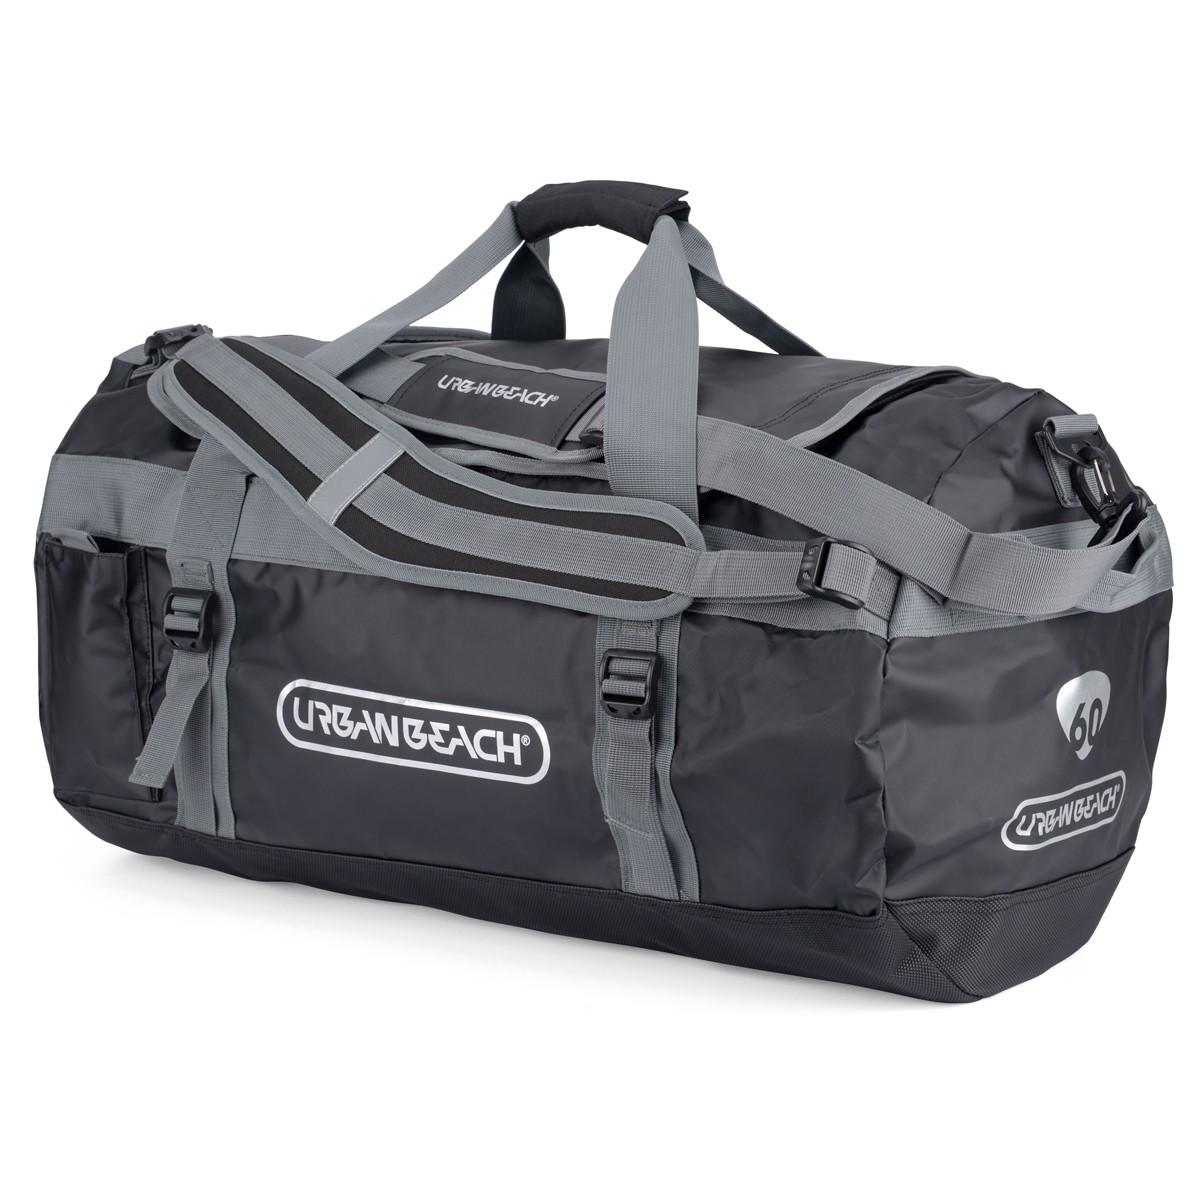 60L Dry Bag - Black